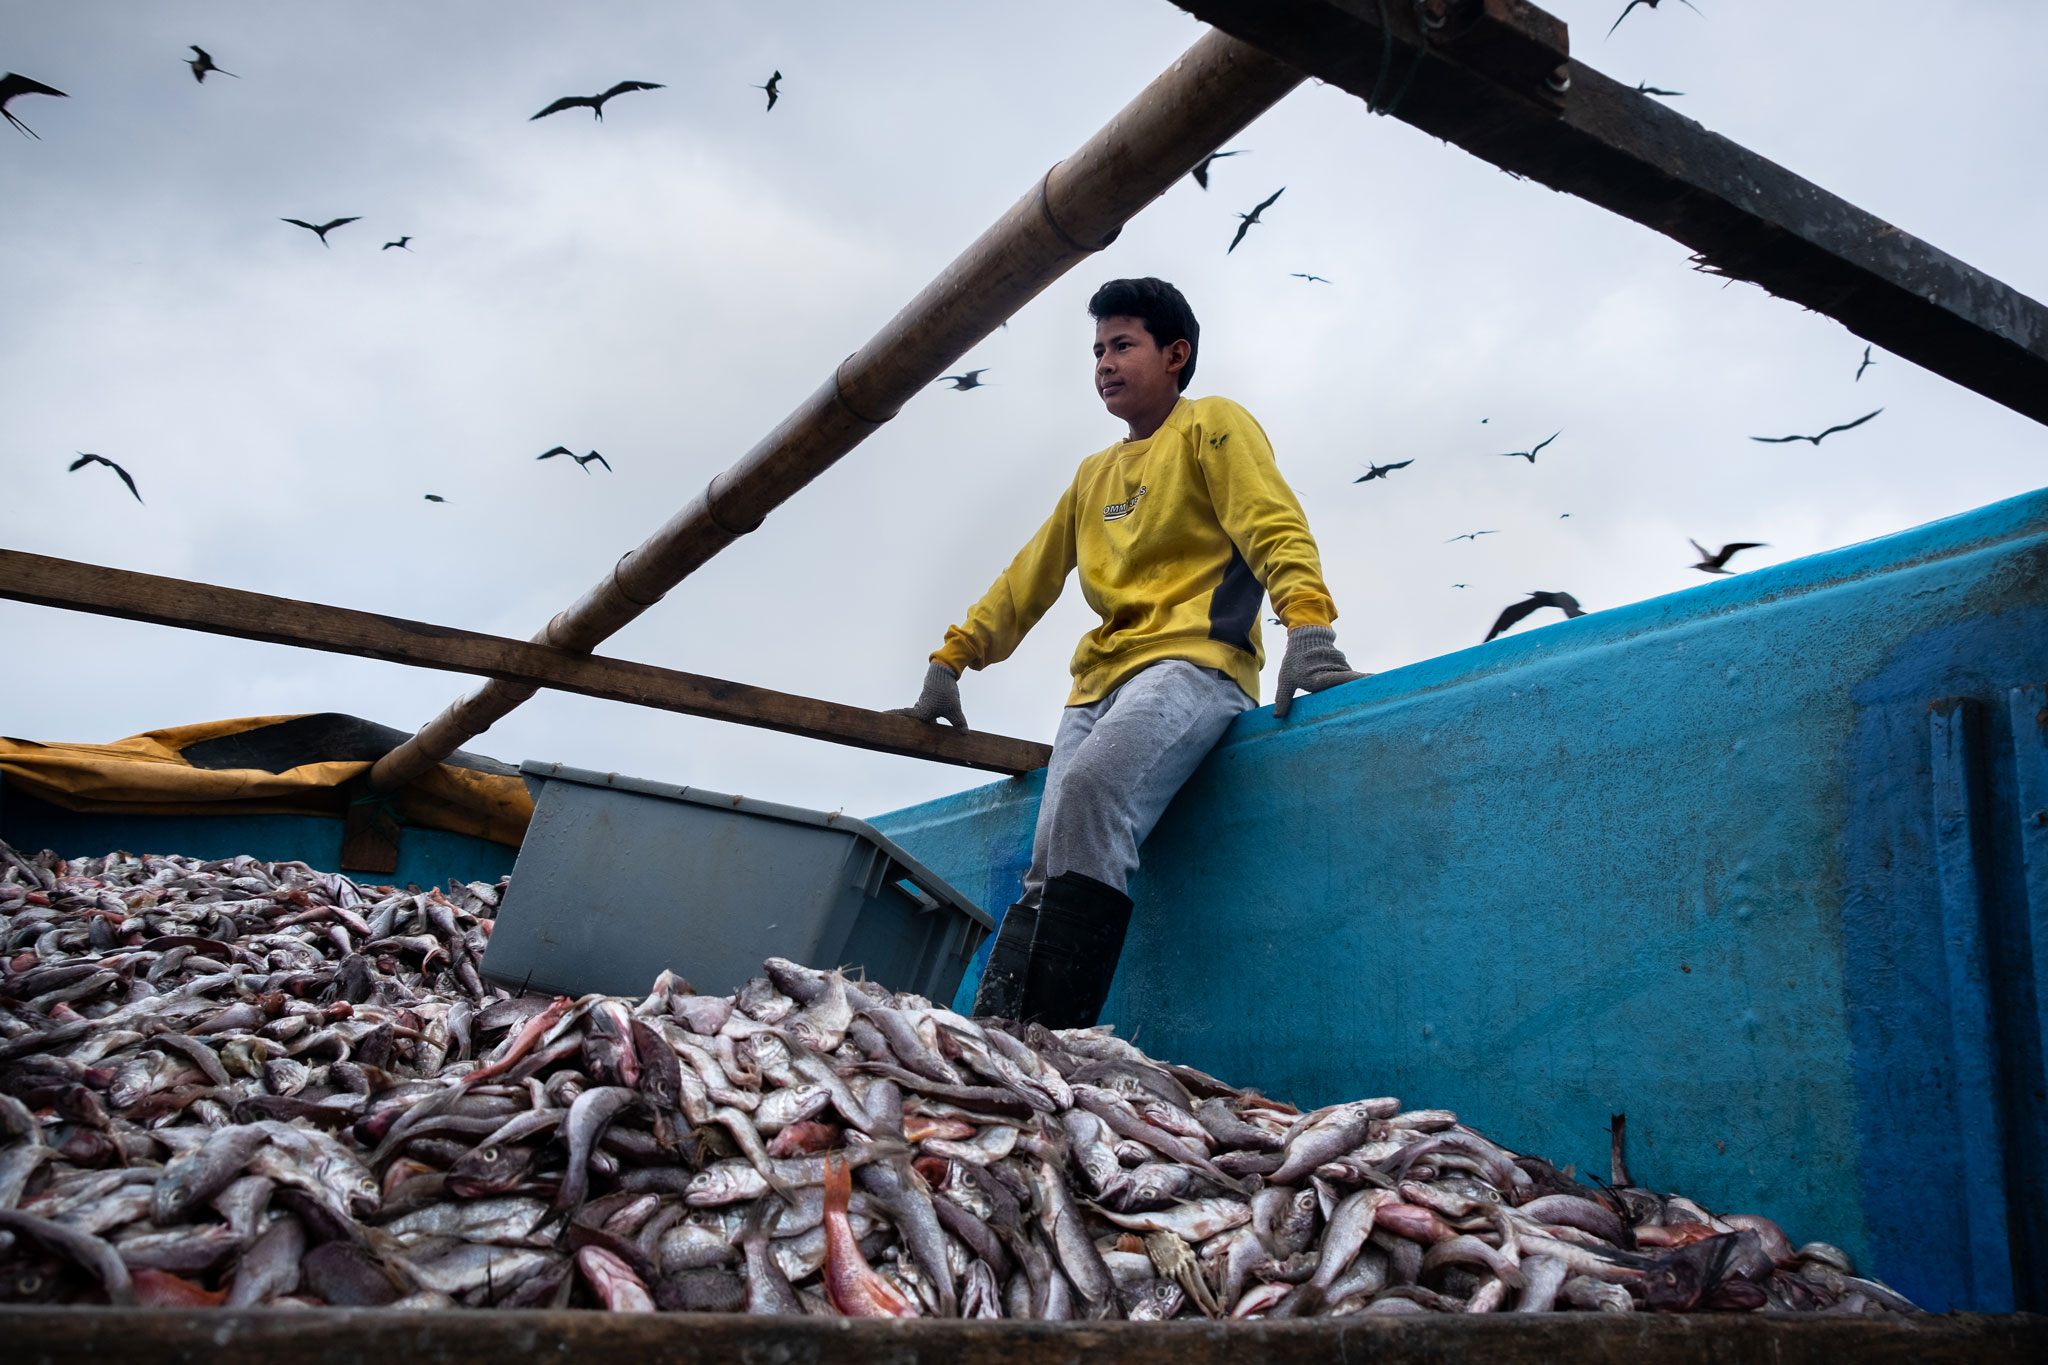 ECUADORIAN FISHERMAN KEEPING THE FISH SAFE FROM THE BIRDS